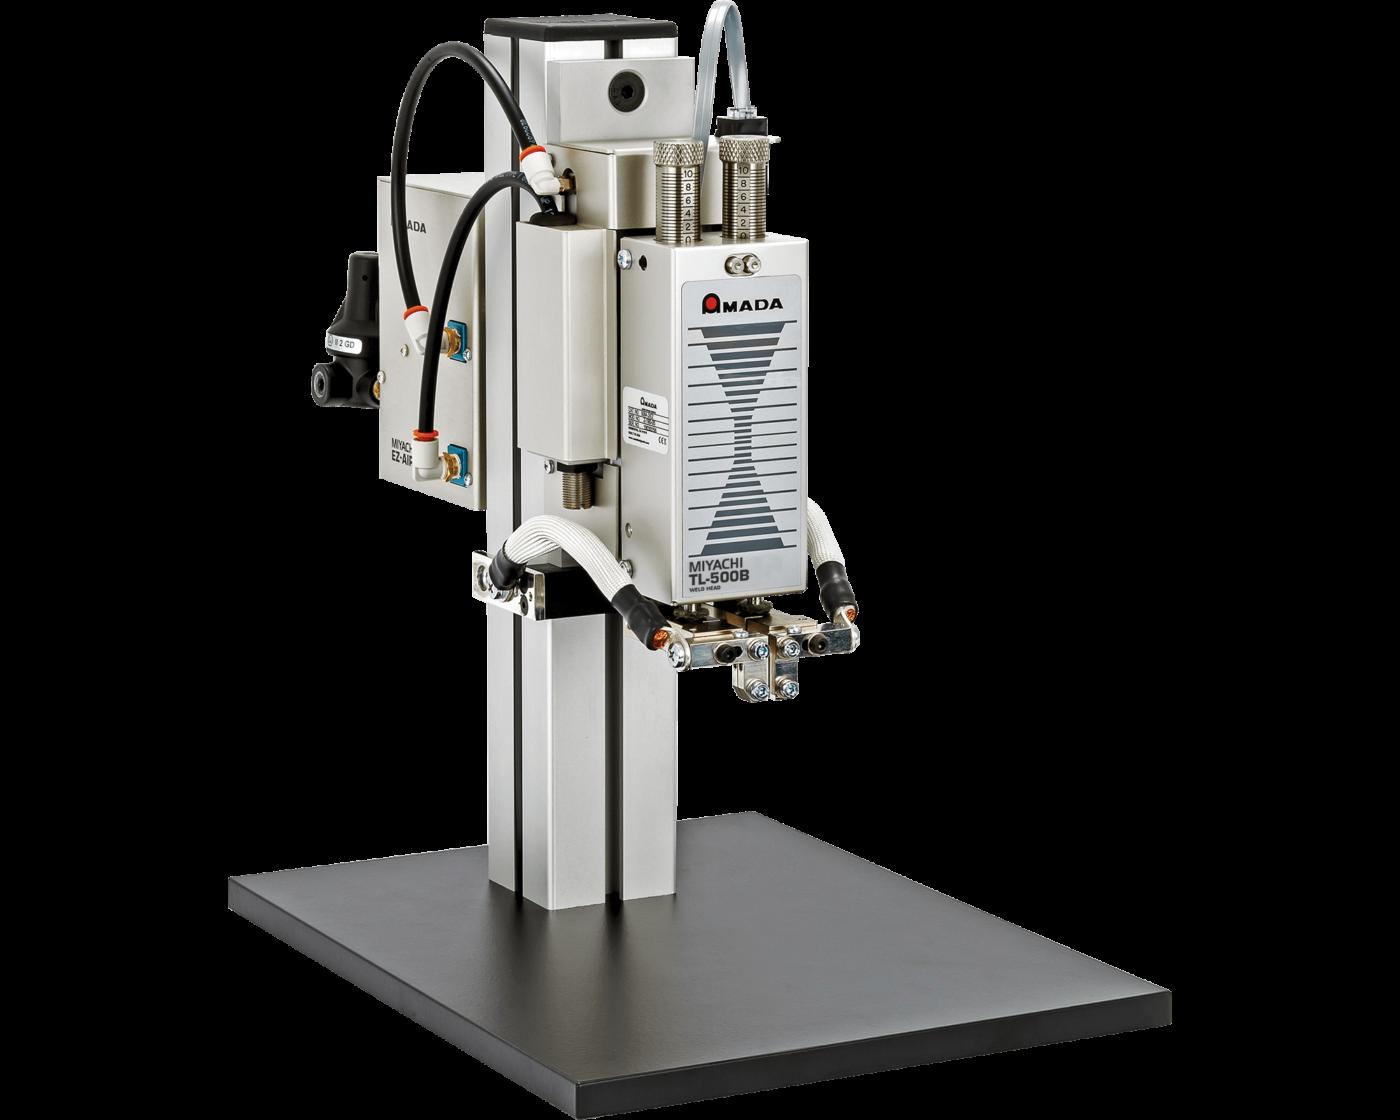 TL-508B-EZ Light Force Pneumatic Weld Head - Series Electrodes